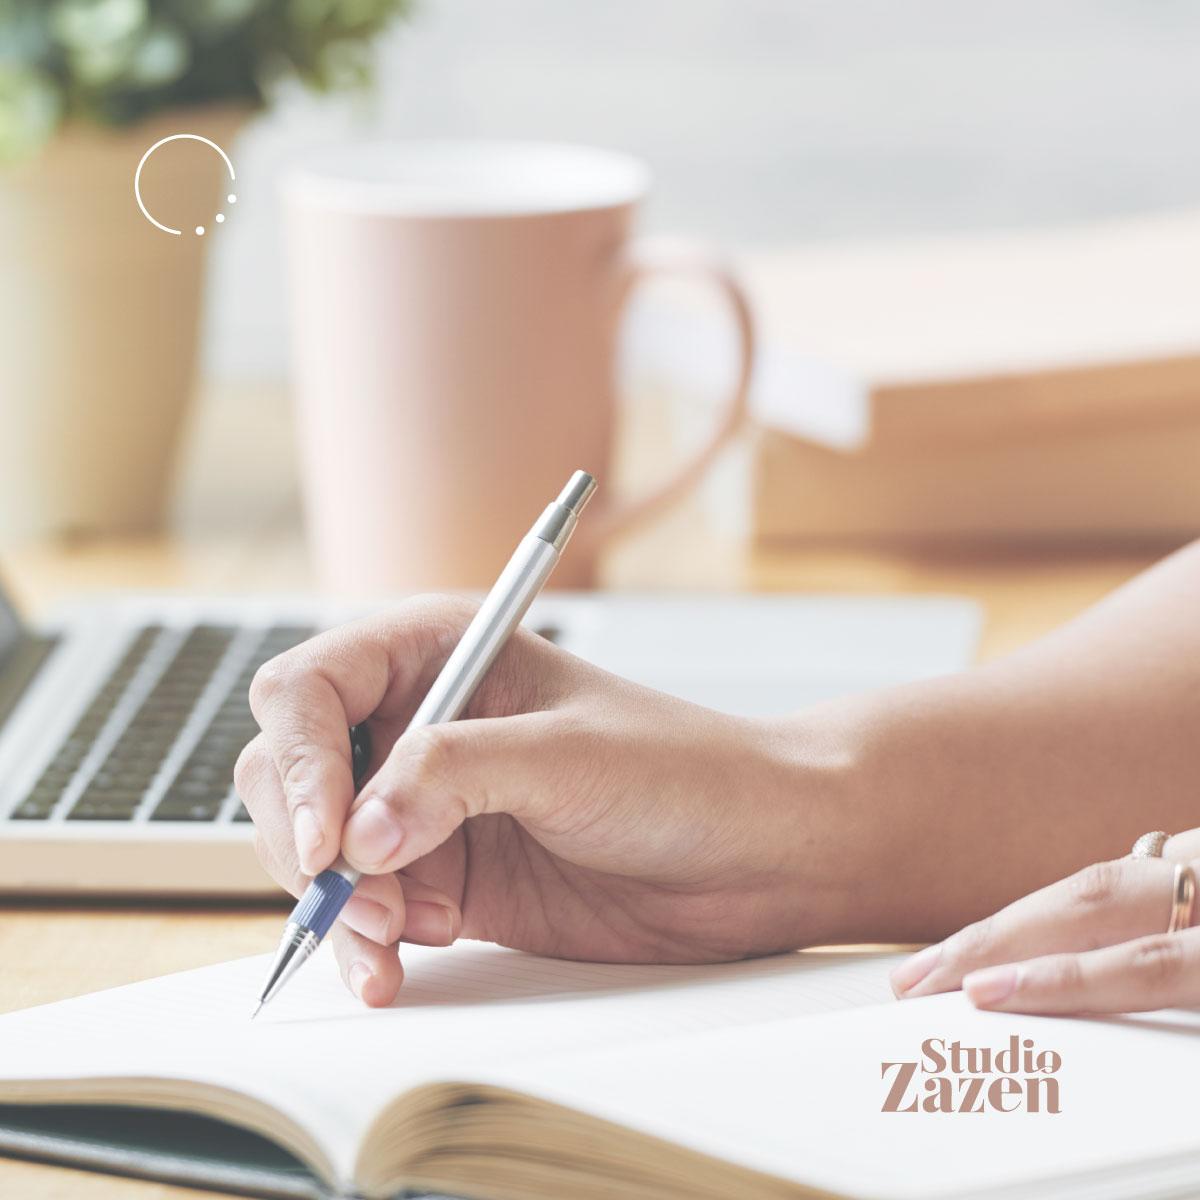 miniblog diseñando la nueva agenda studio zazen